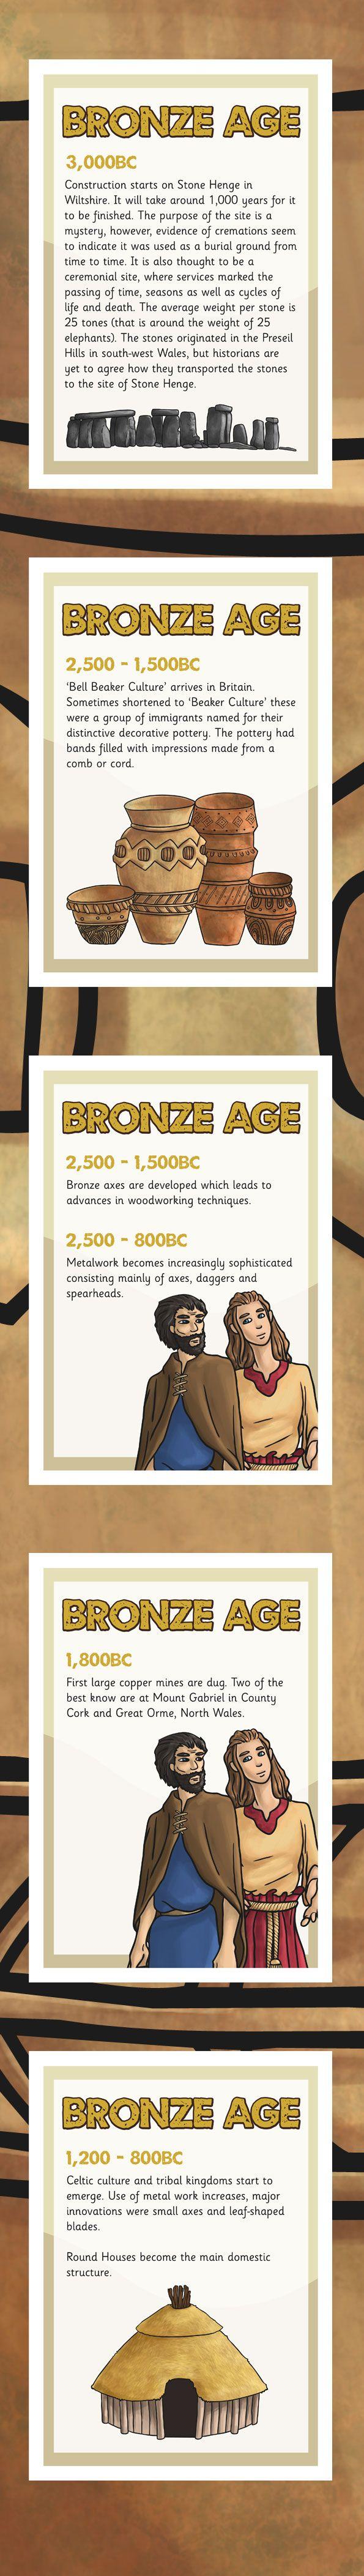 KS2  History Timelines- Bronze Age Timeline Posters